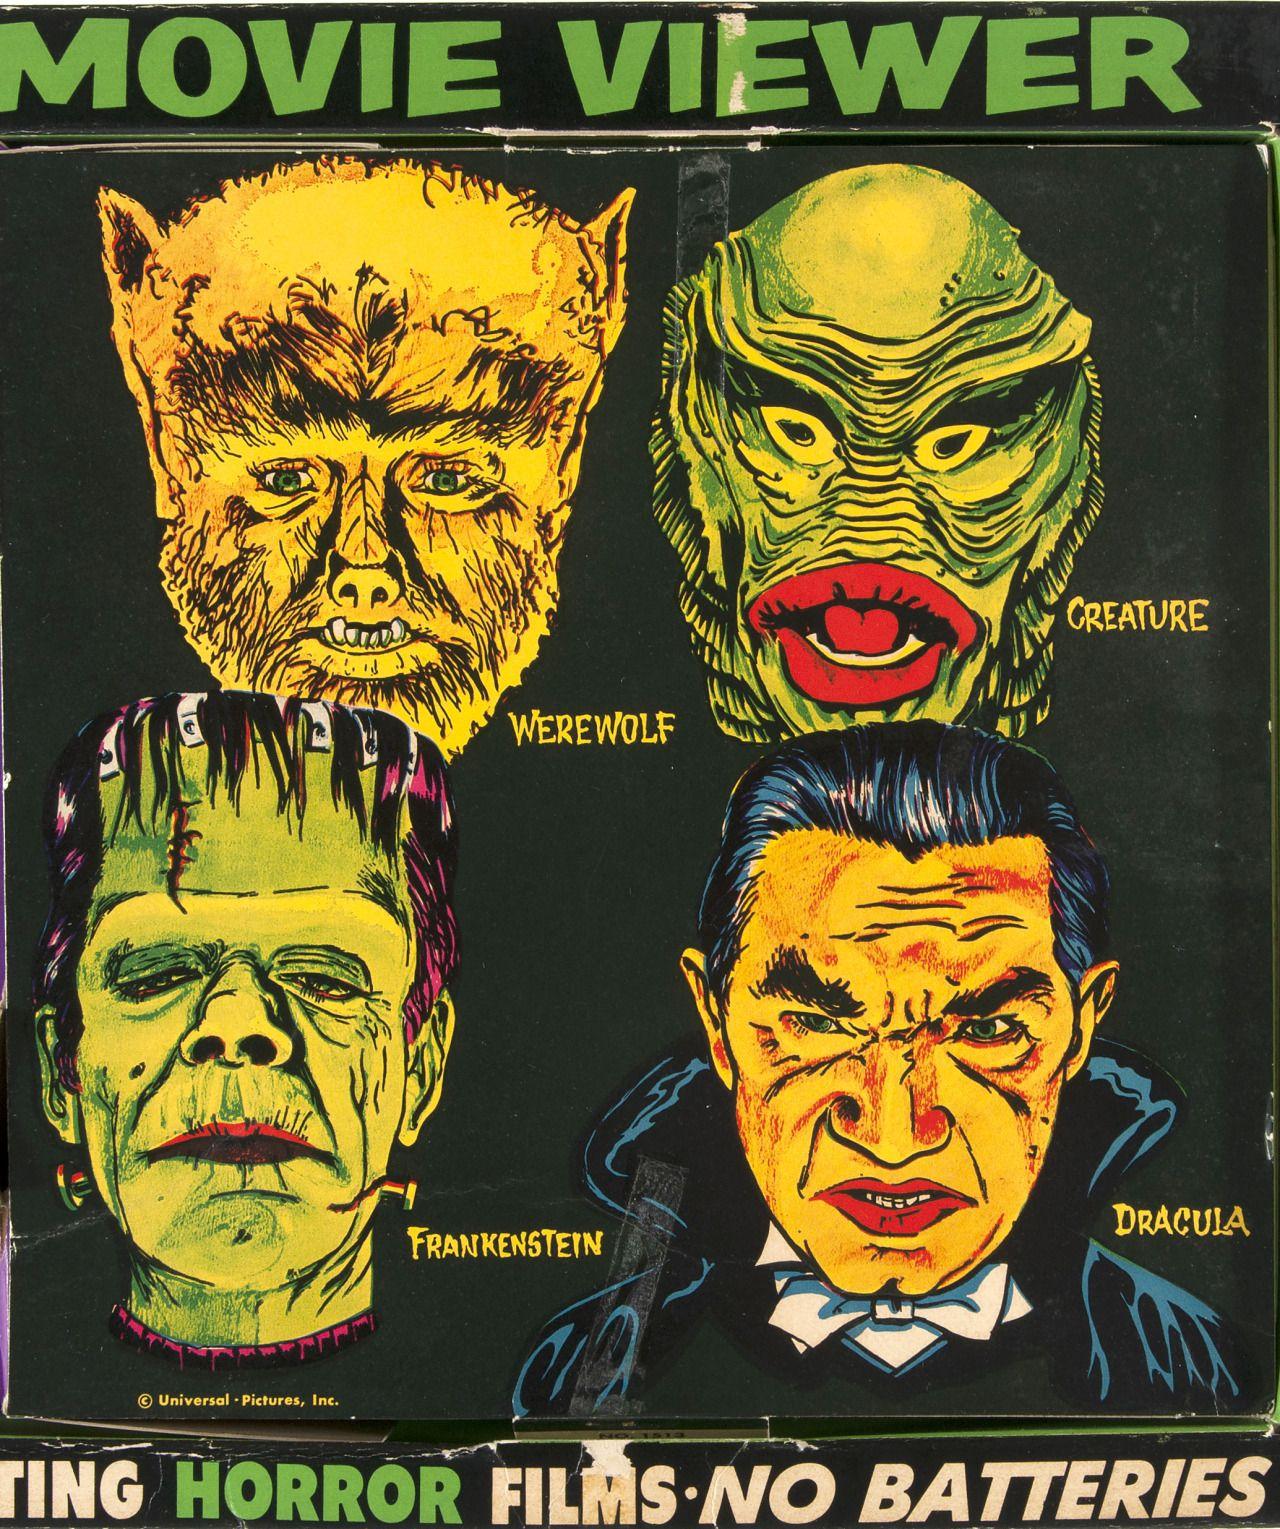 1960s Horrorscope Monster Viewer | Spooky Kids Stuff